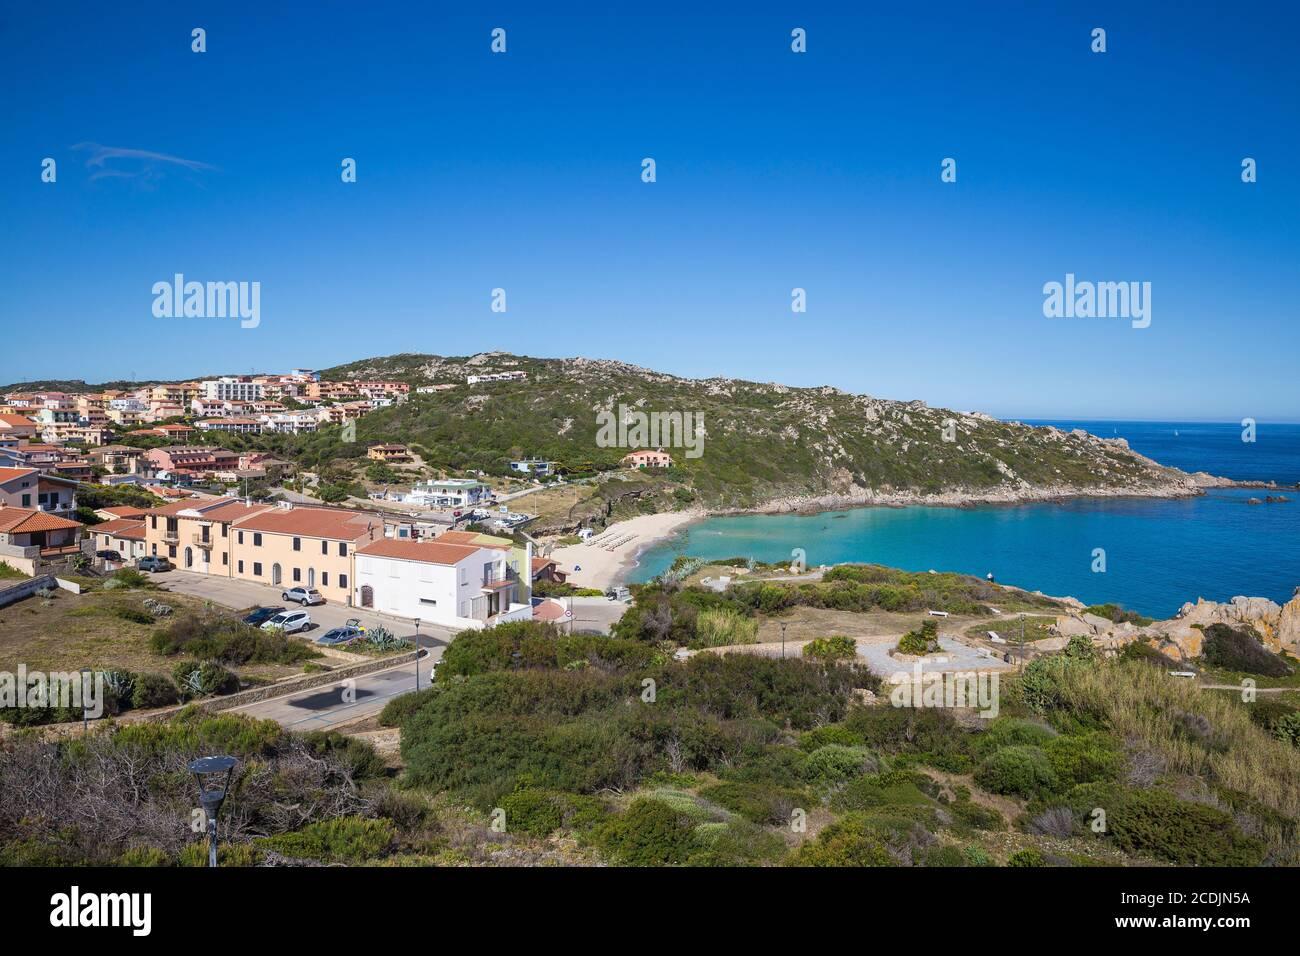 Italy, Sardinia, Santa Teresa Gallura, Rena Bianca beach Stock Photo